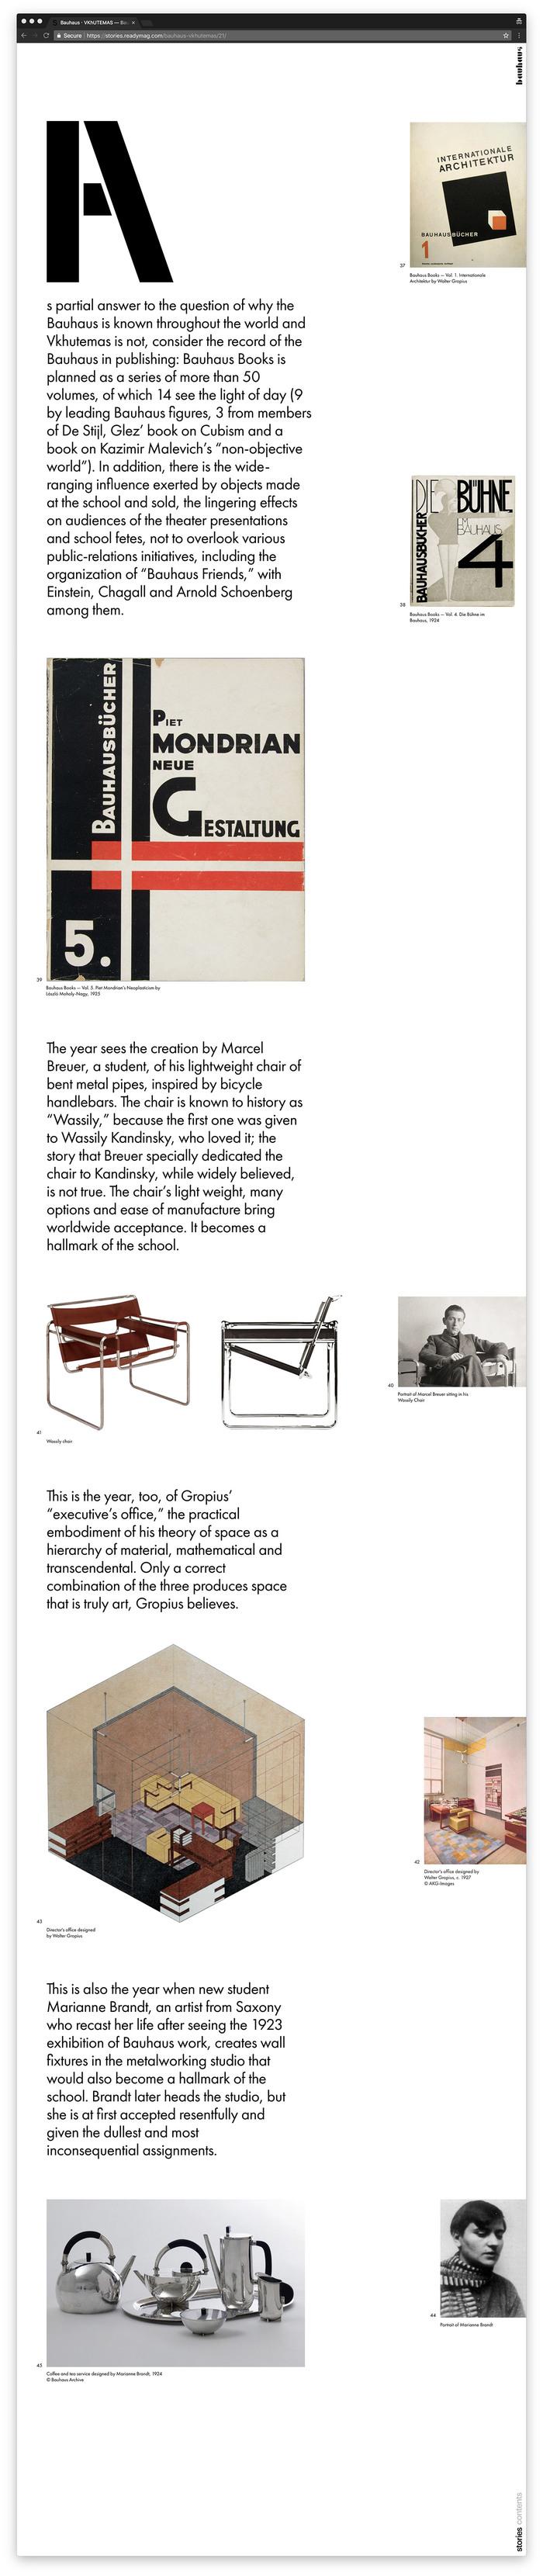 Readymag Stories: Bauhaus Vkhutemas 5